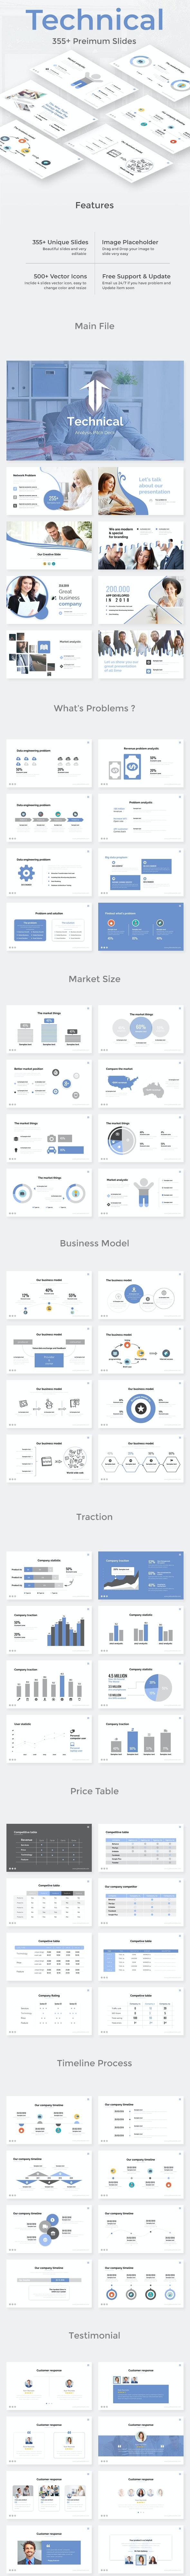 Technical Analysis Pitch Deck Google Slide Template - Google Slides Presentation Templates